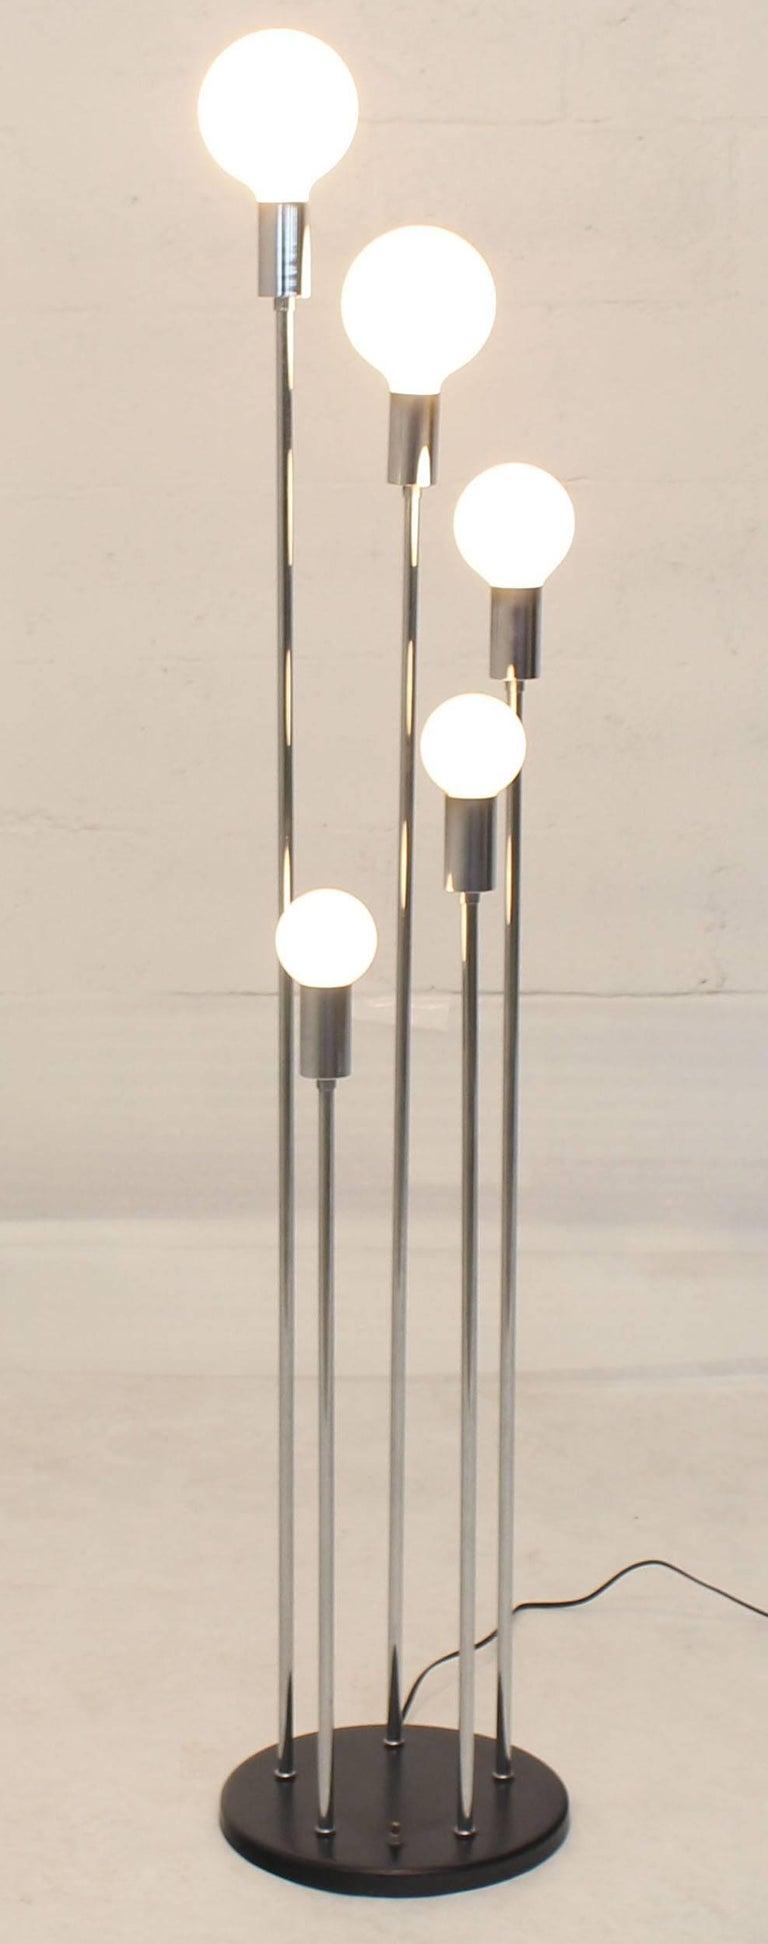 FLOOR LAMP Light 3 Way Chrome Lighting